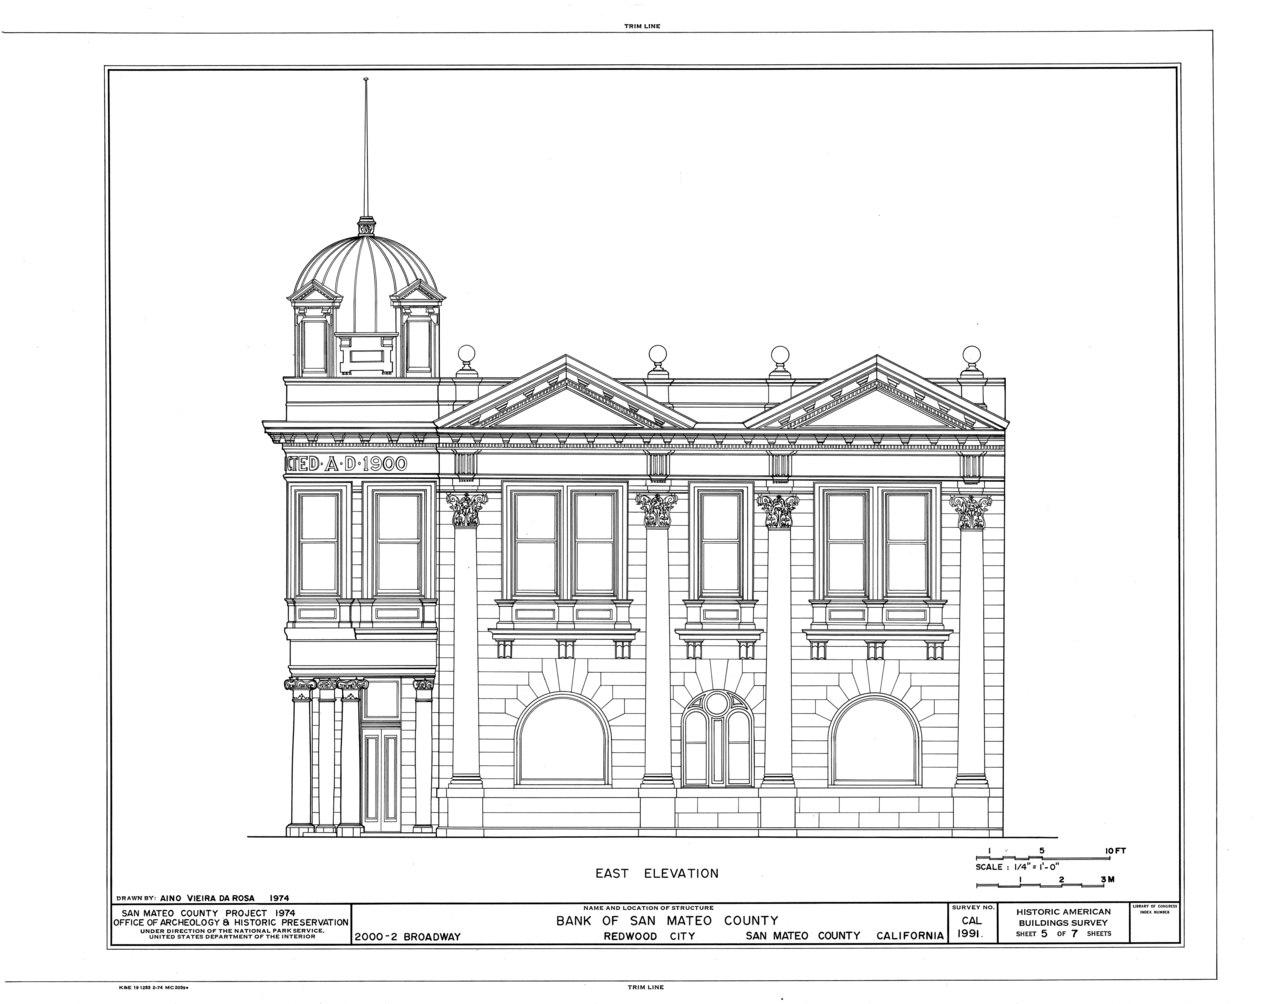 File Bank Of San Mateo County Broadway Redwood